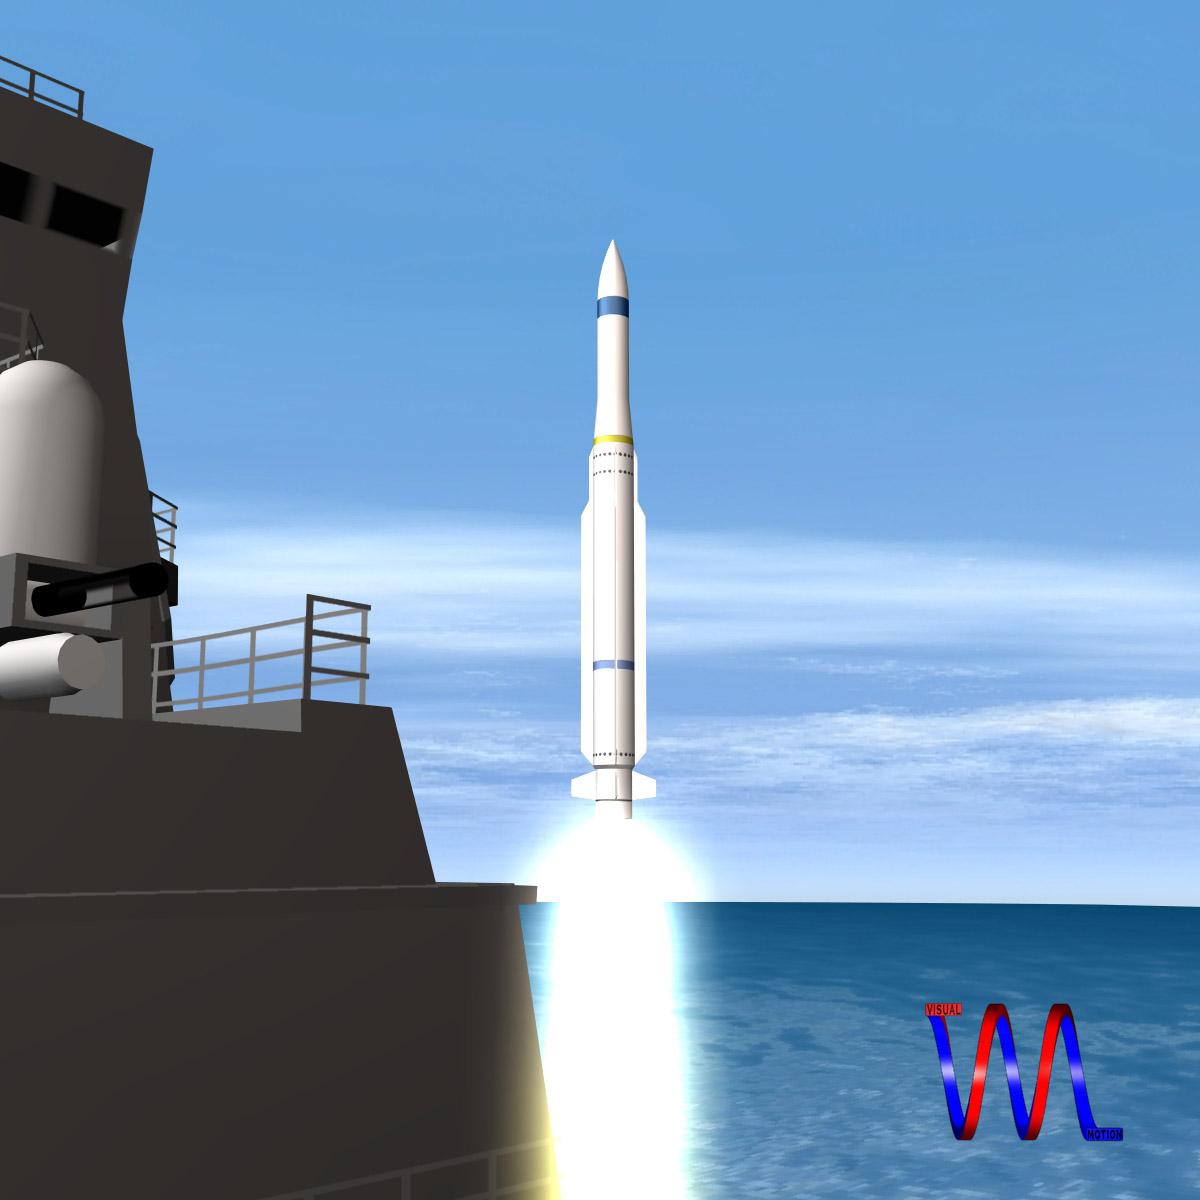 rim-162 эсийн пуужин 3d загвар 3ds dxf fbx холимог cob dae x obj 166018